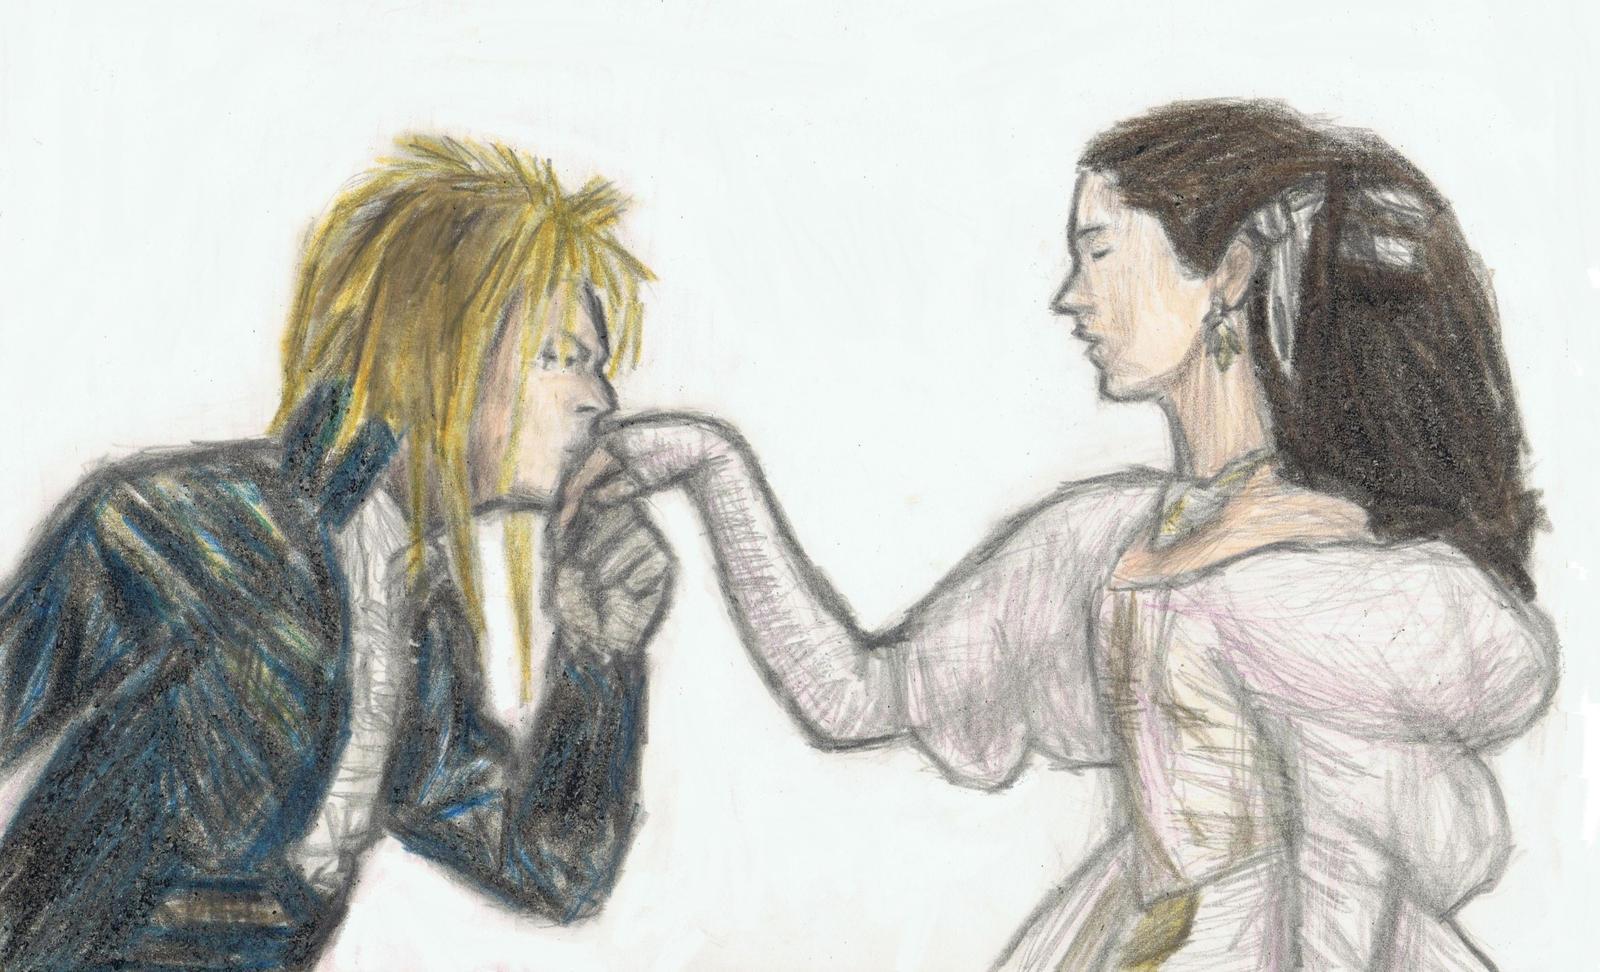 Jareth kissing on Sarah's hand by gagambo